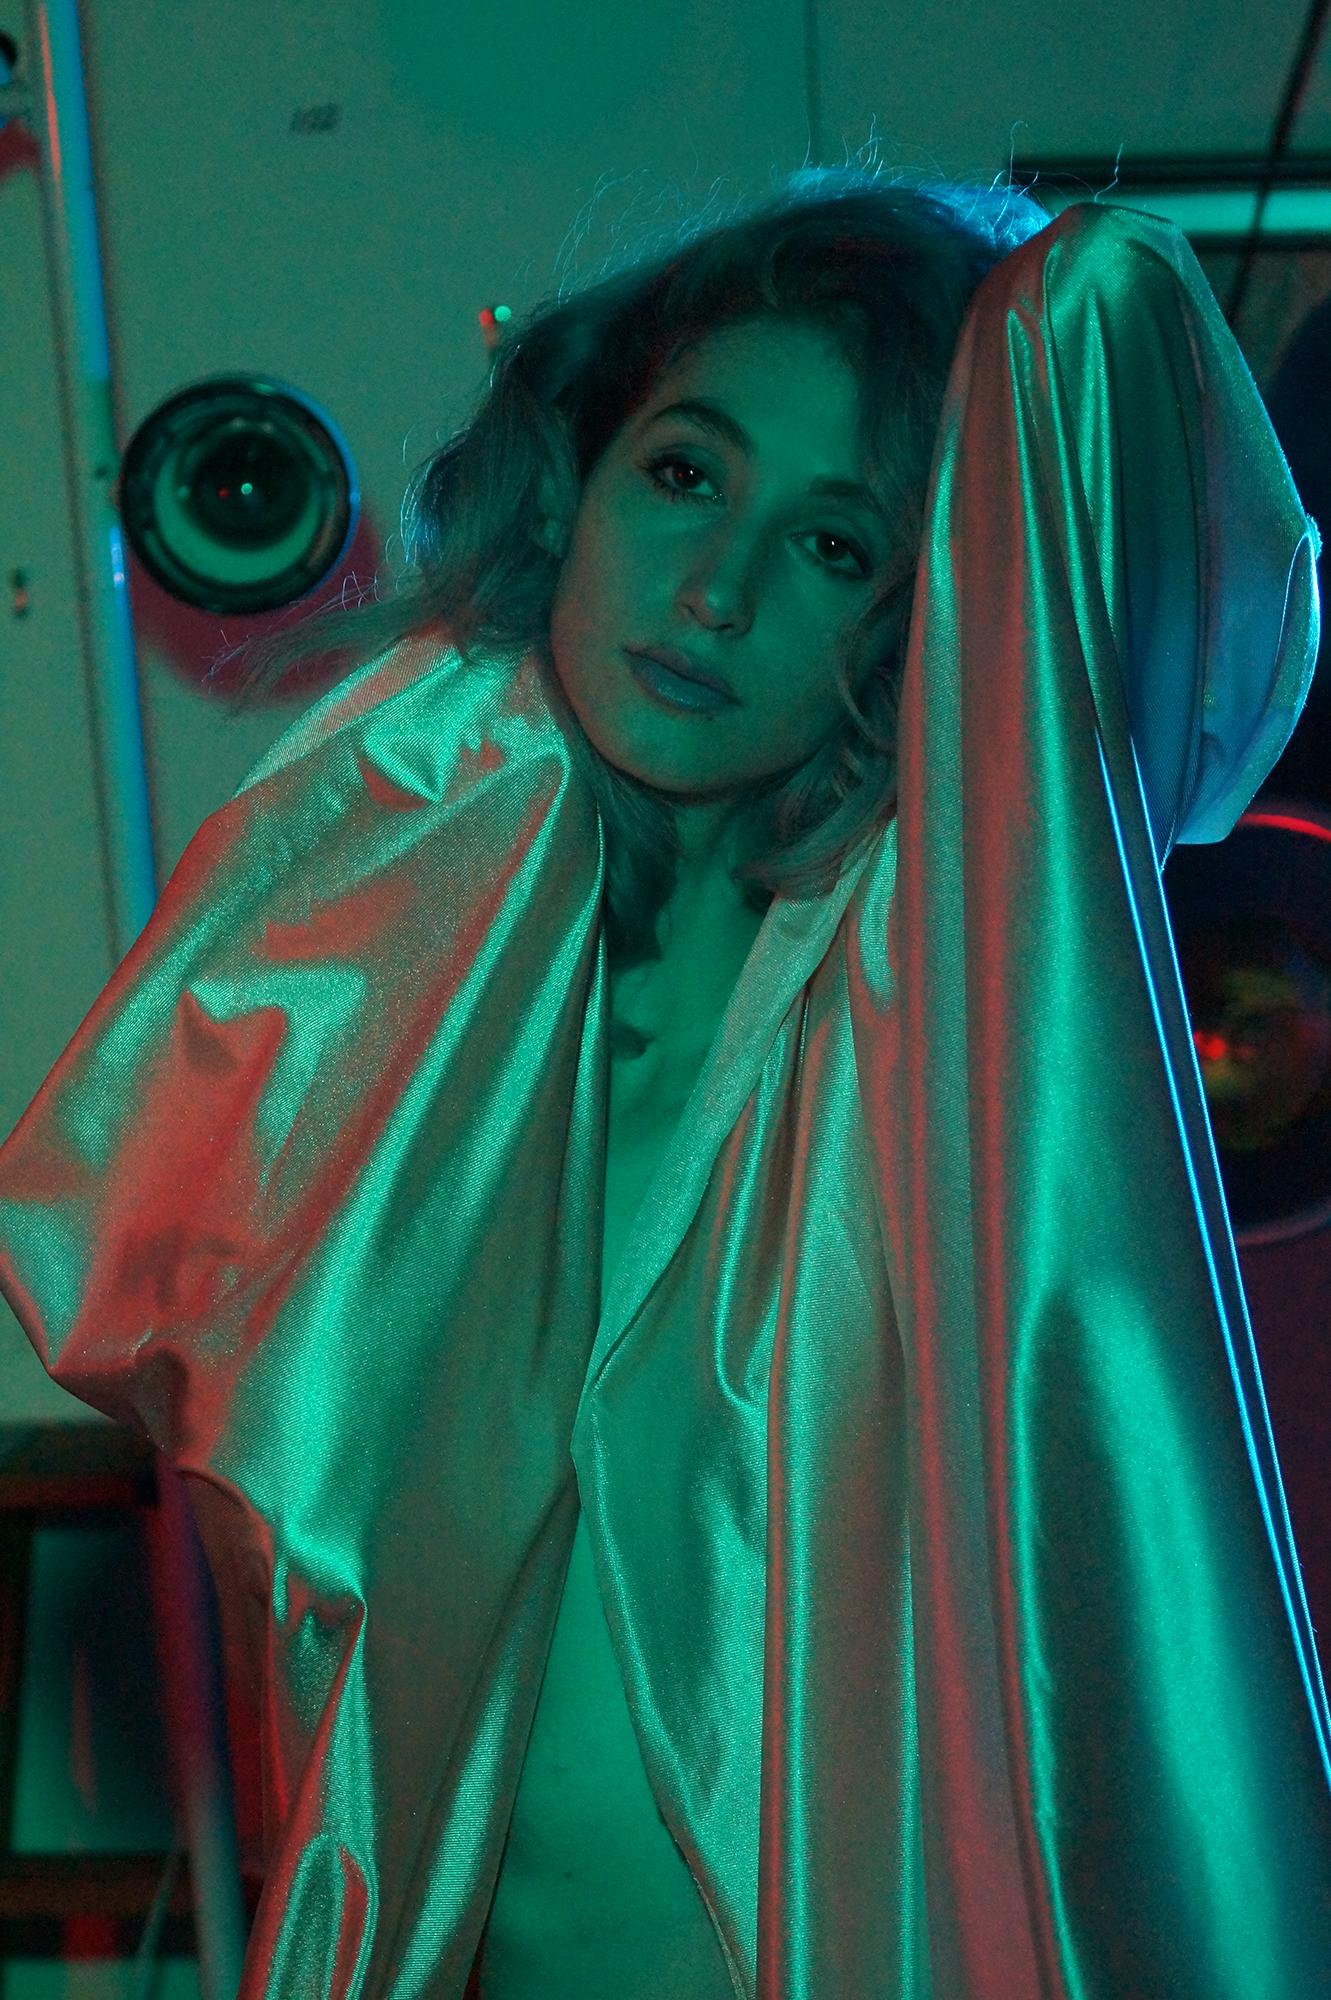 Geena Matuson (@geenamatuson) modeling in the studio, 2015.